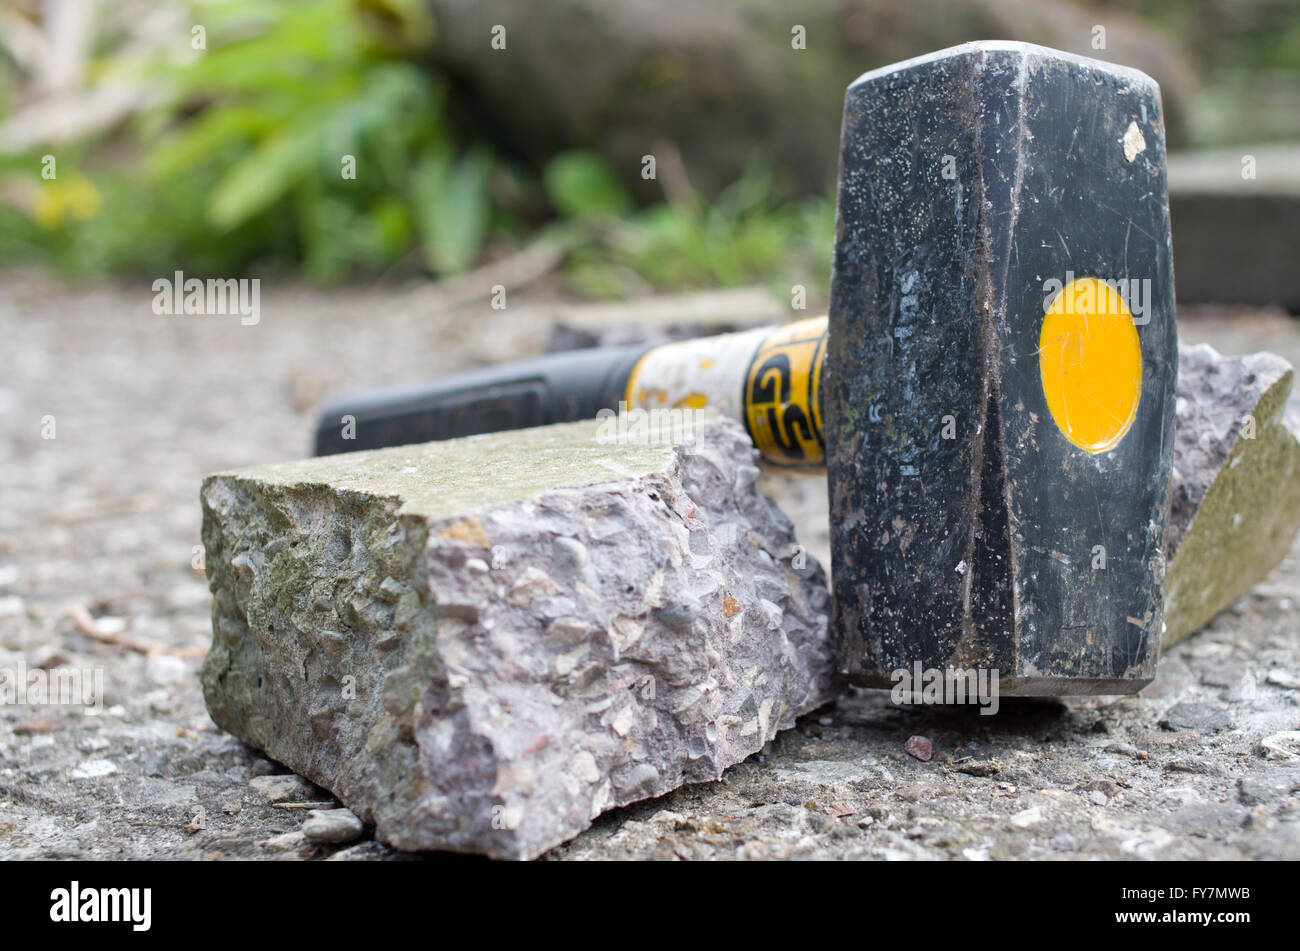 Lump hammer used to break up concrete - Stock Image